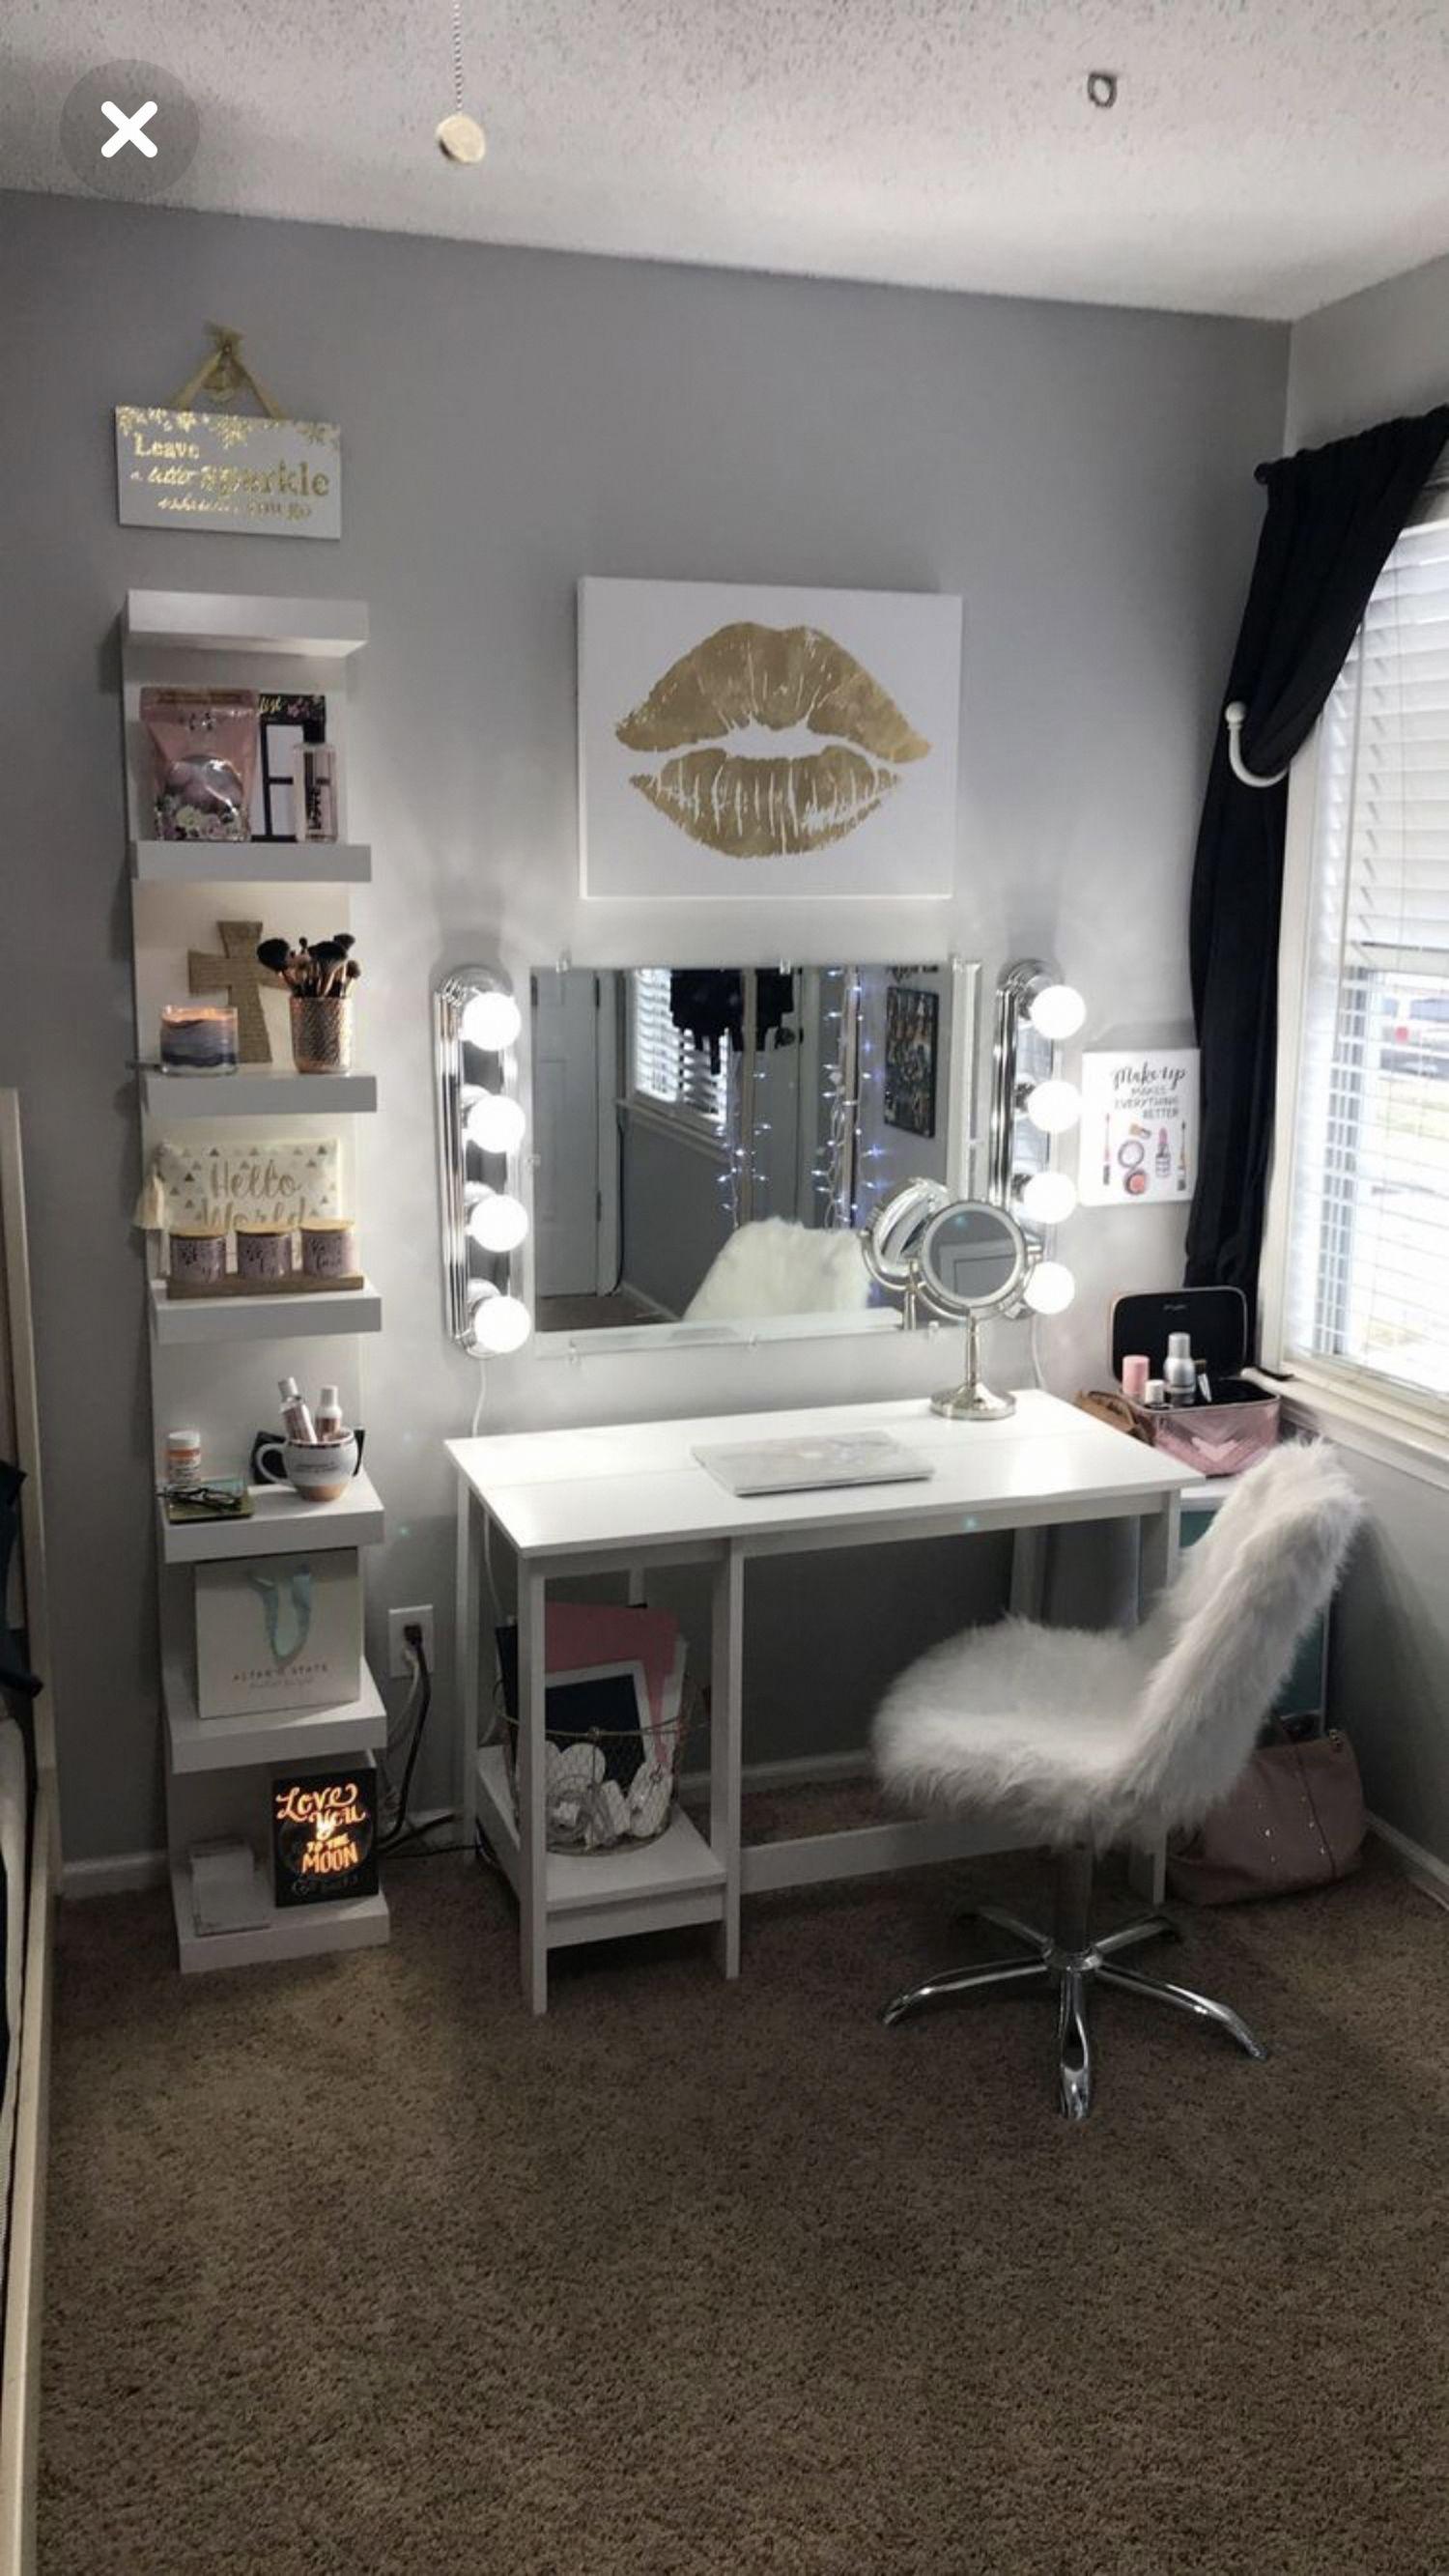 70 Beautiful Teenage Bedroom Ideas For Small Rooms 51 Small Room Bedroom Bedroom Design Teenage Girl Bedroom Diy